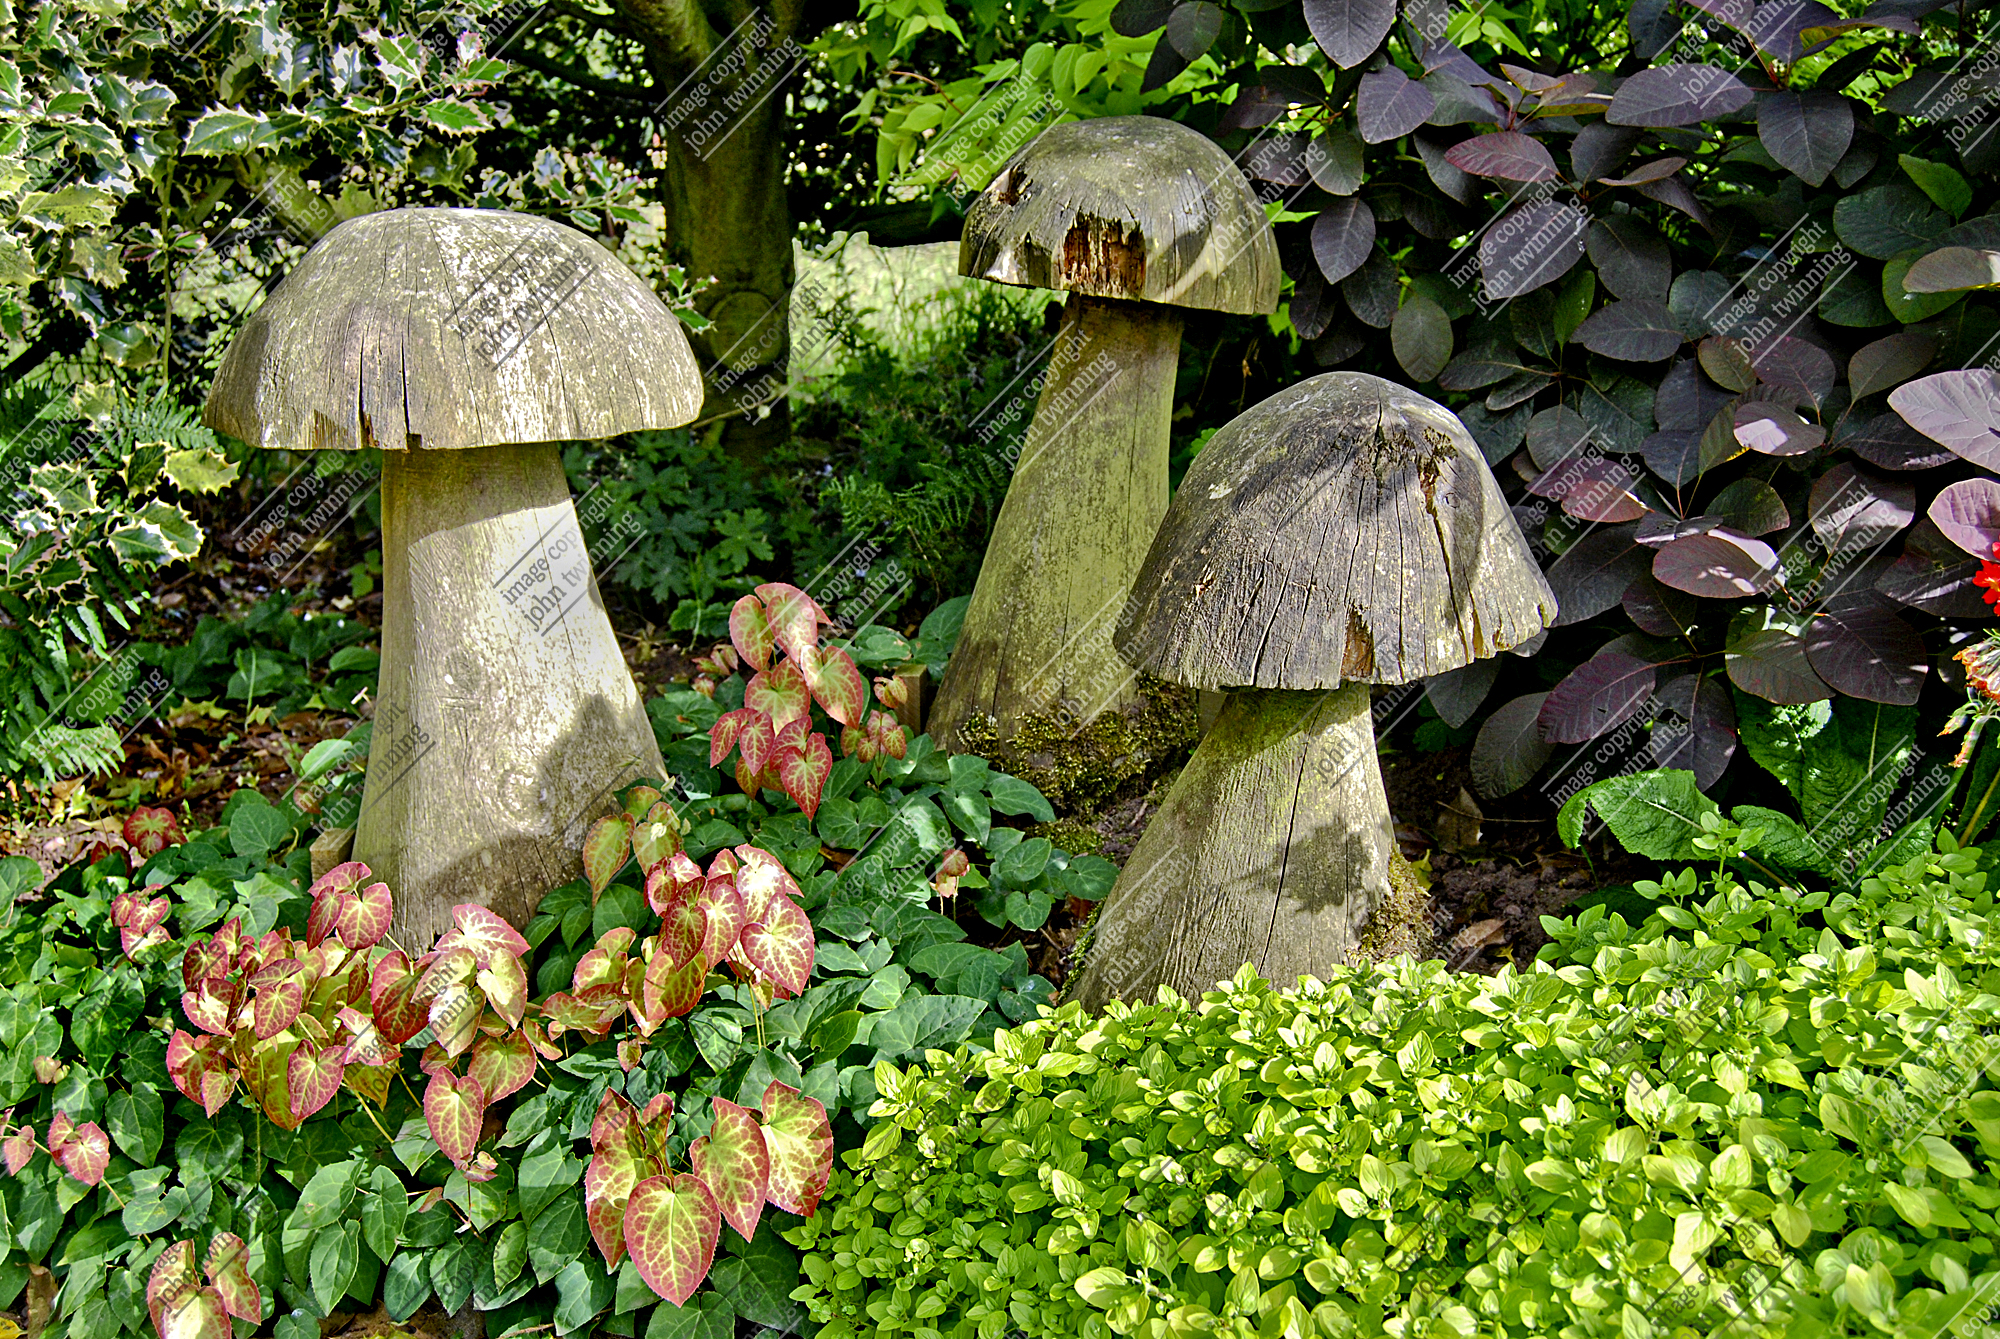 Mushroom Mystery (photograph)